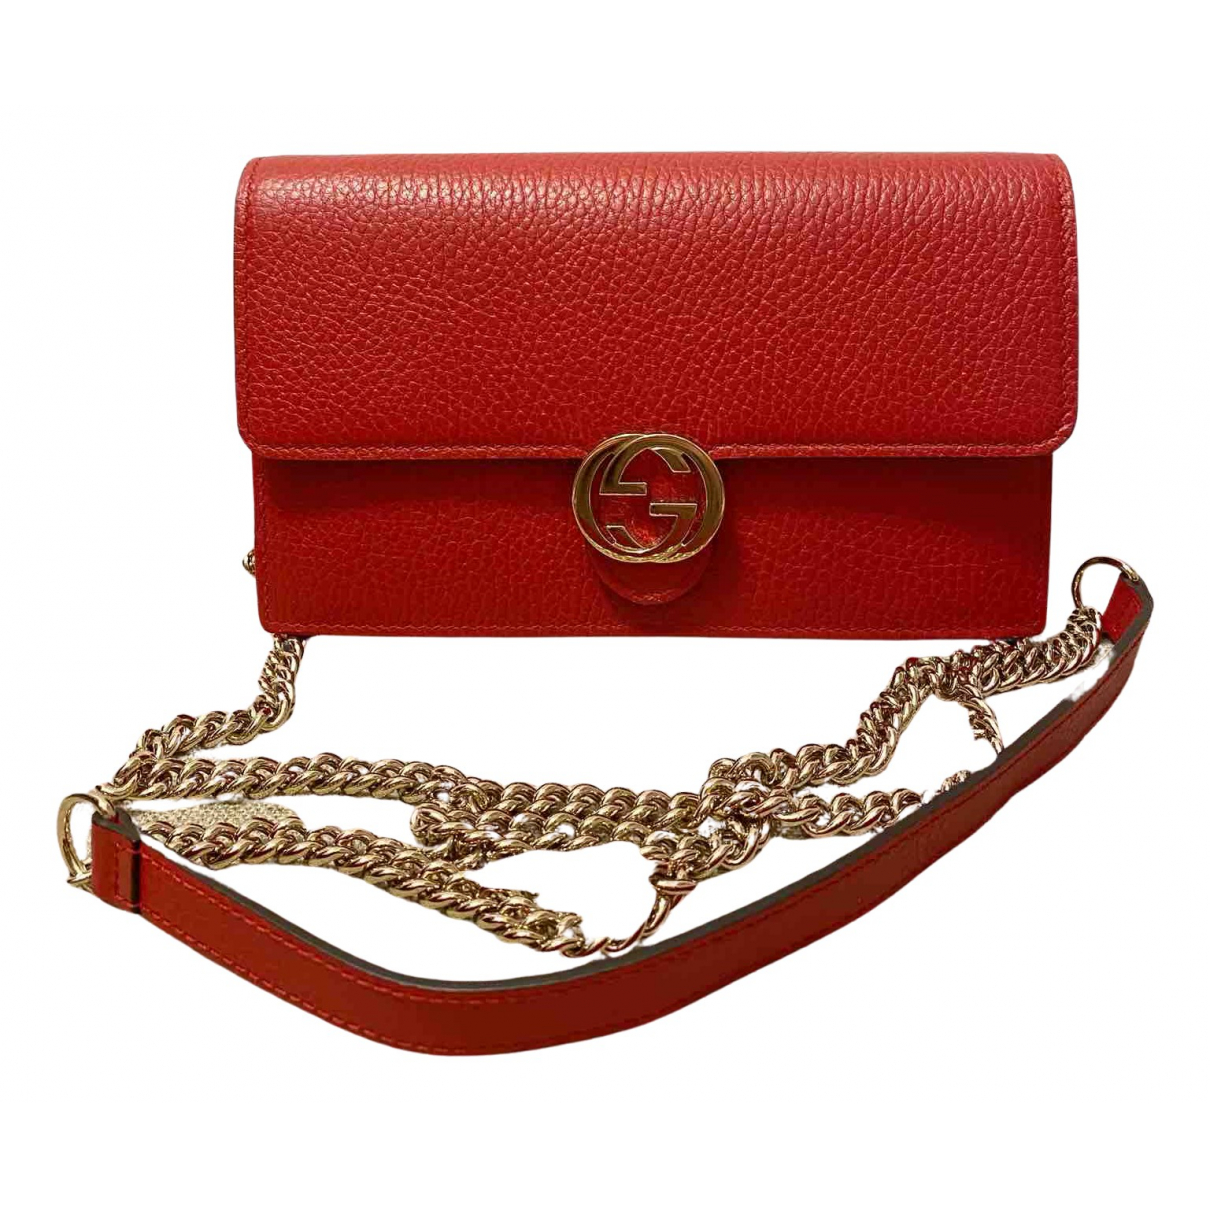 Gucci - Sac a main Interlocking pour femme en cuir - rouge